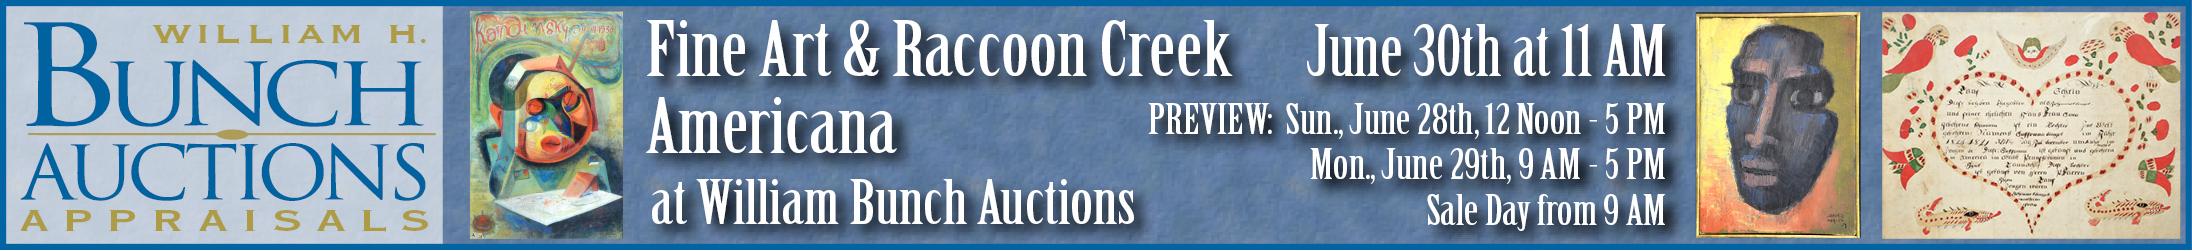 William H. Bunch - Auctions & Appraisals